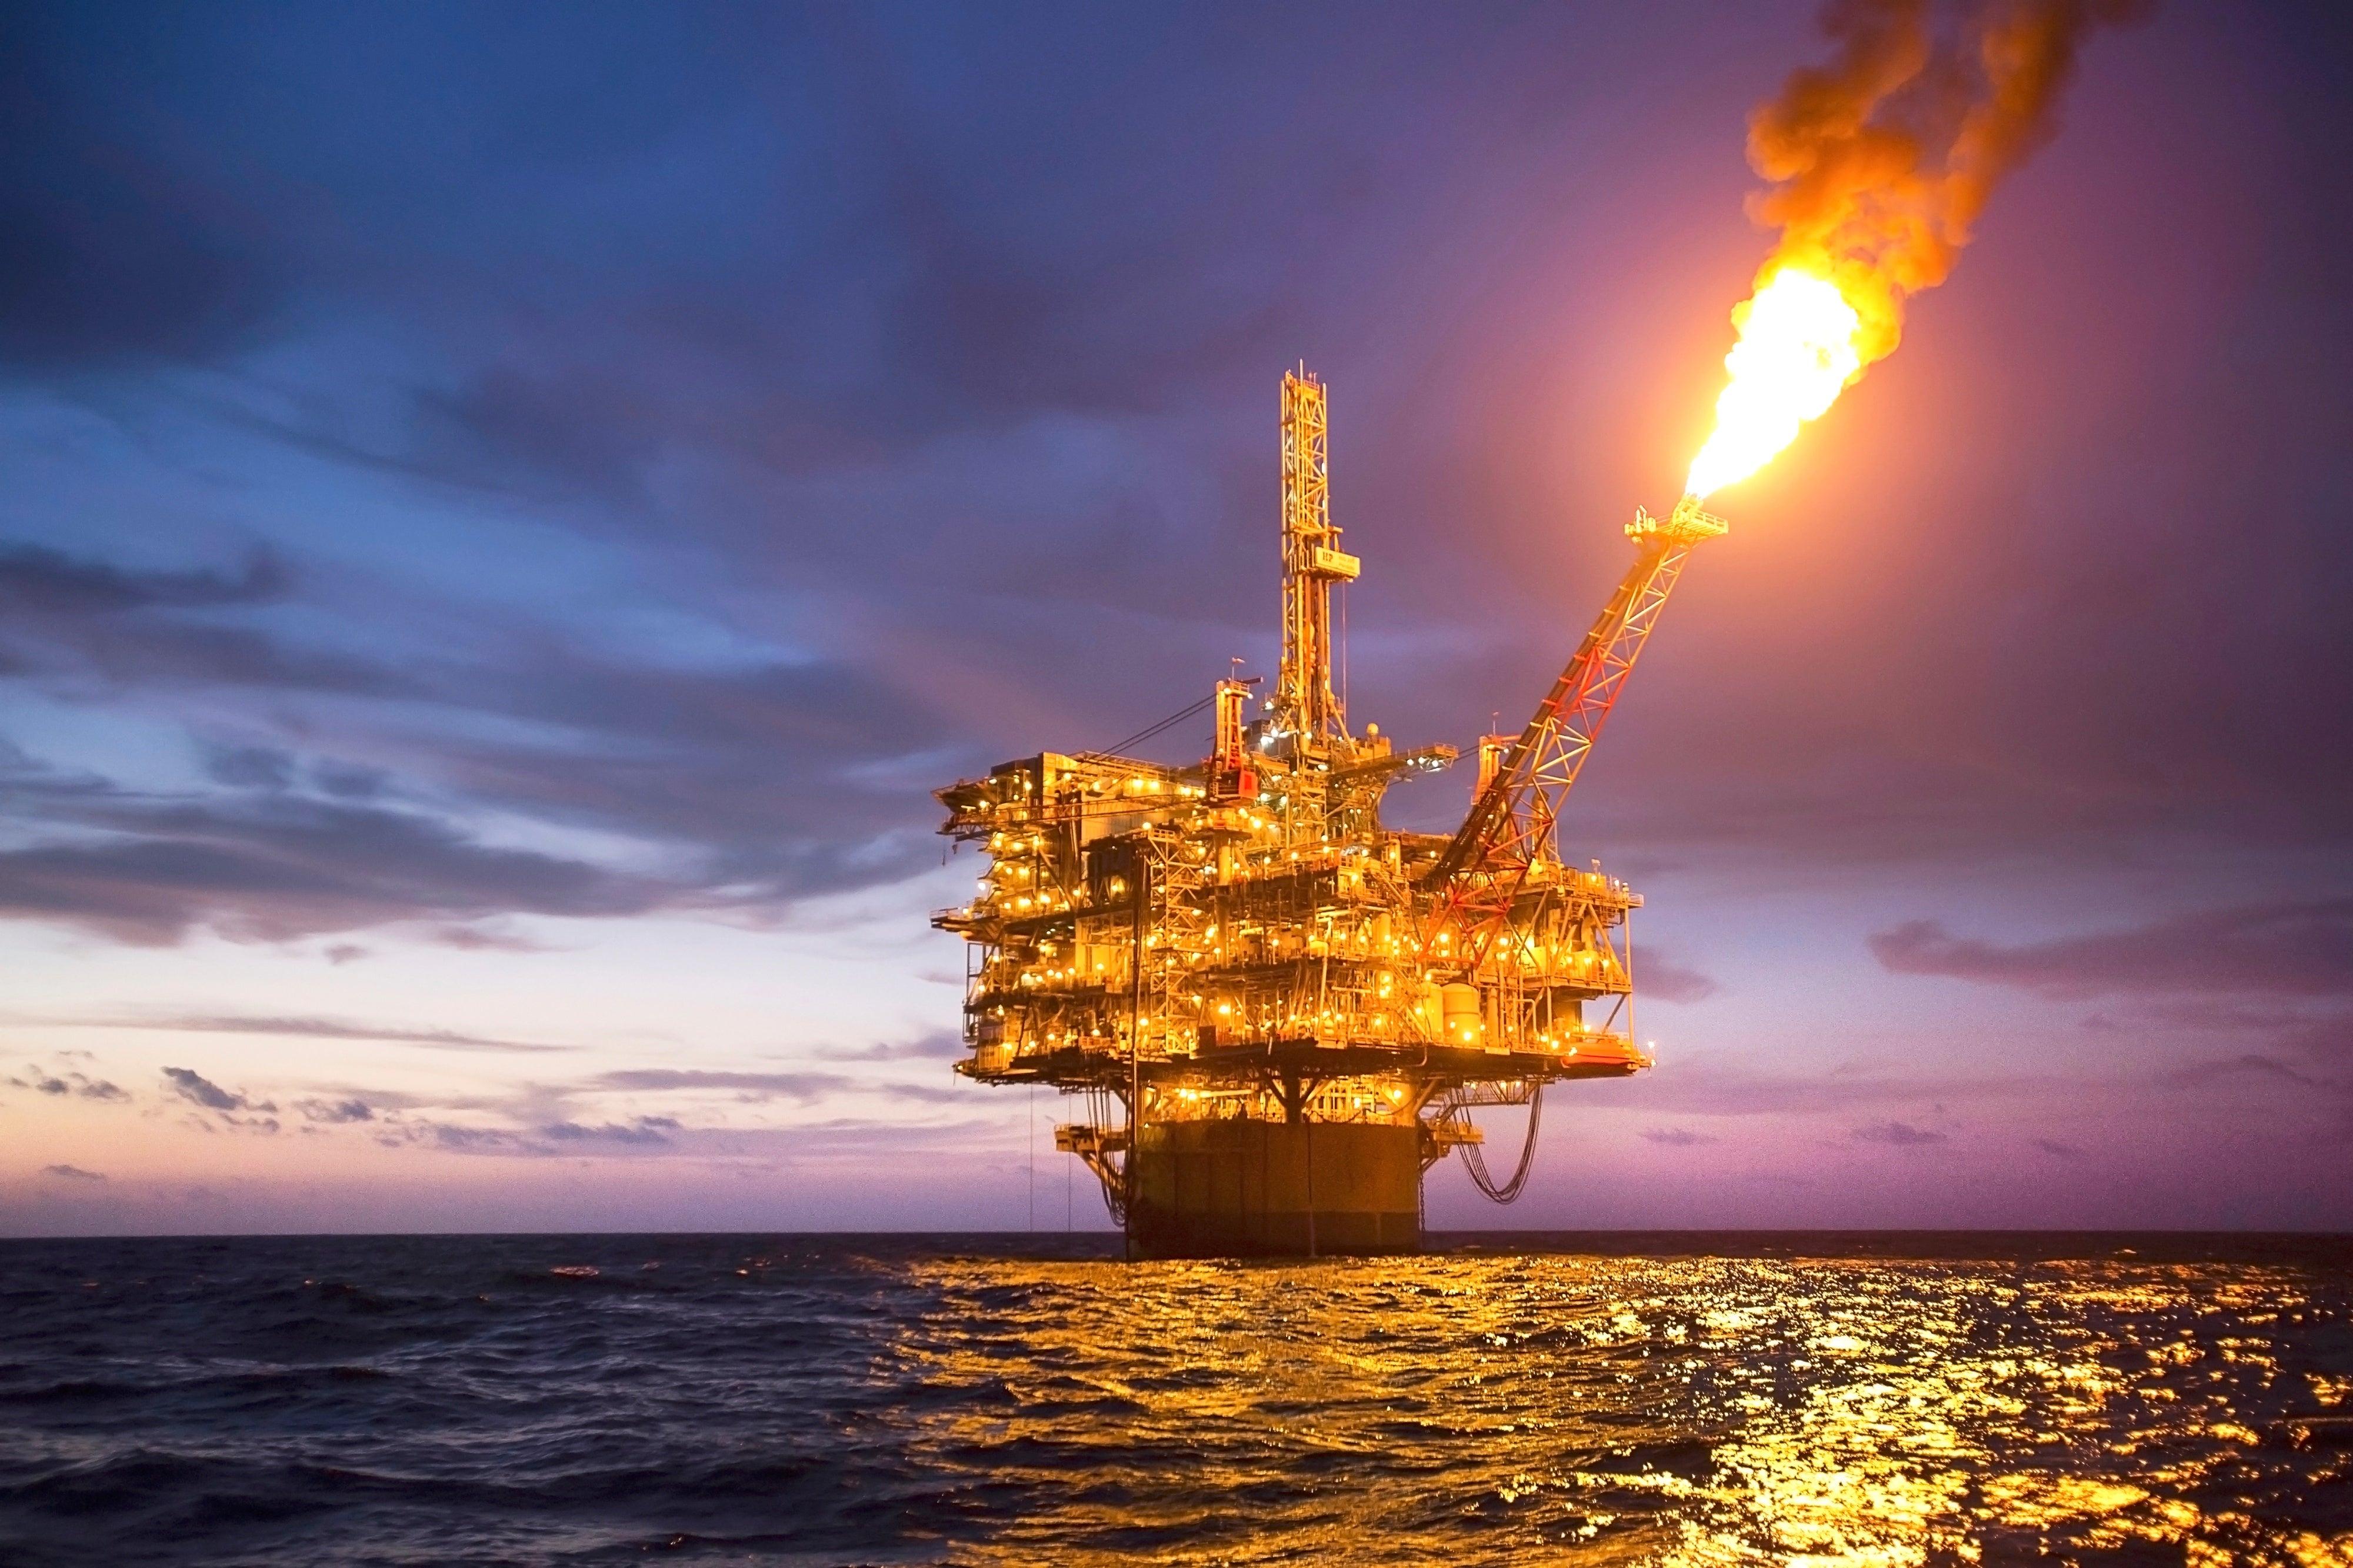 Powerful investors push big companies to plan for climate change powerful investors push big companies to plan for climate change scientific american publicscrutiny Choice Image